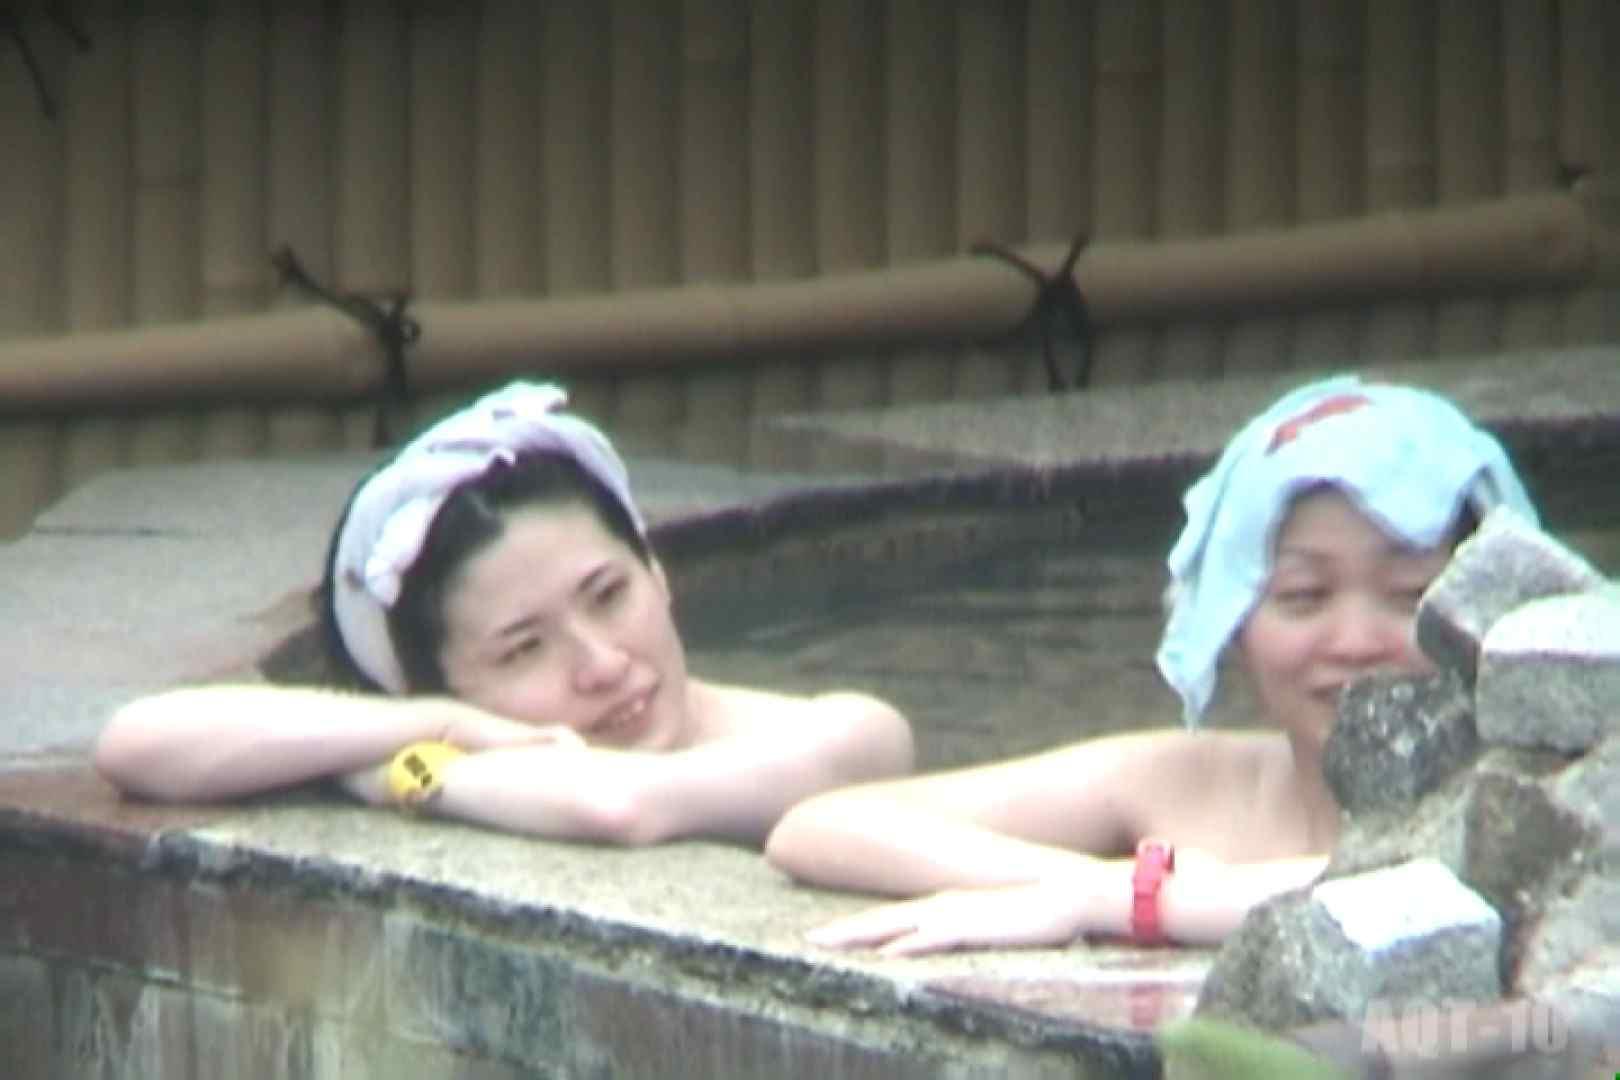 Aquaな露天風呂Vol.793 盗撮映像  72Pix 32